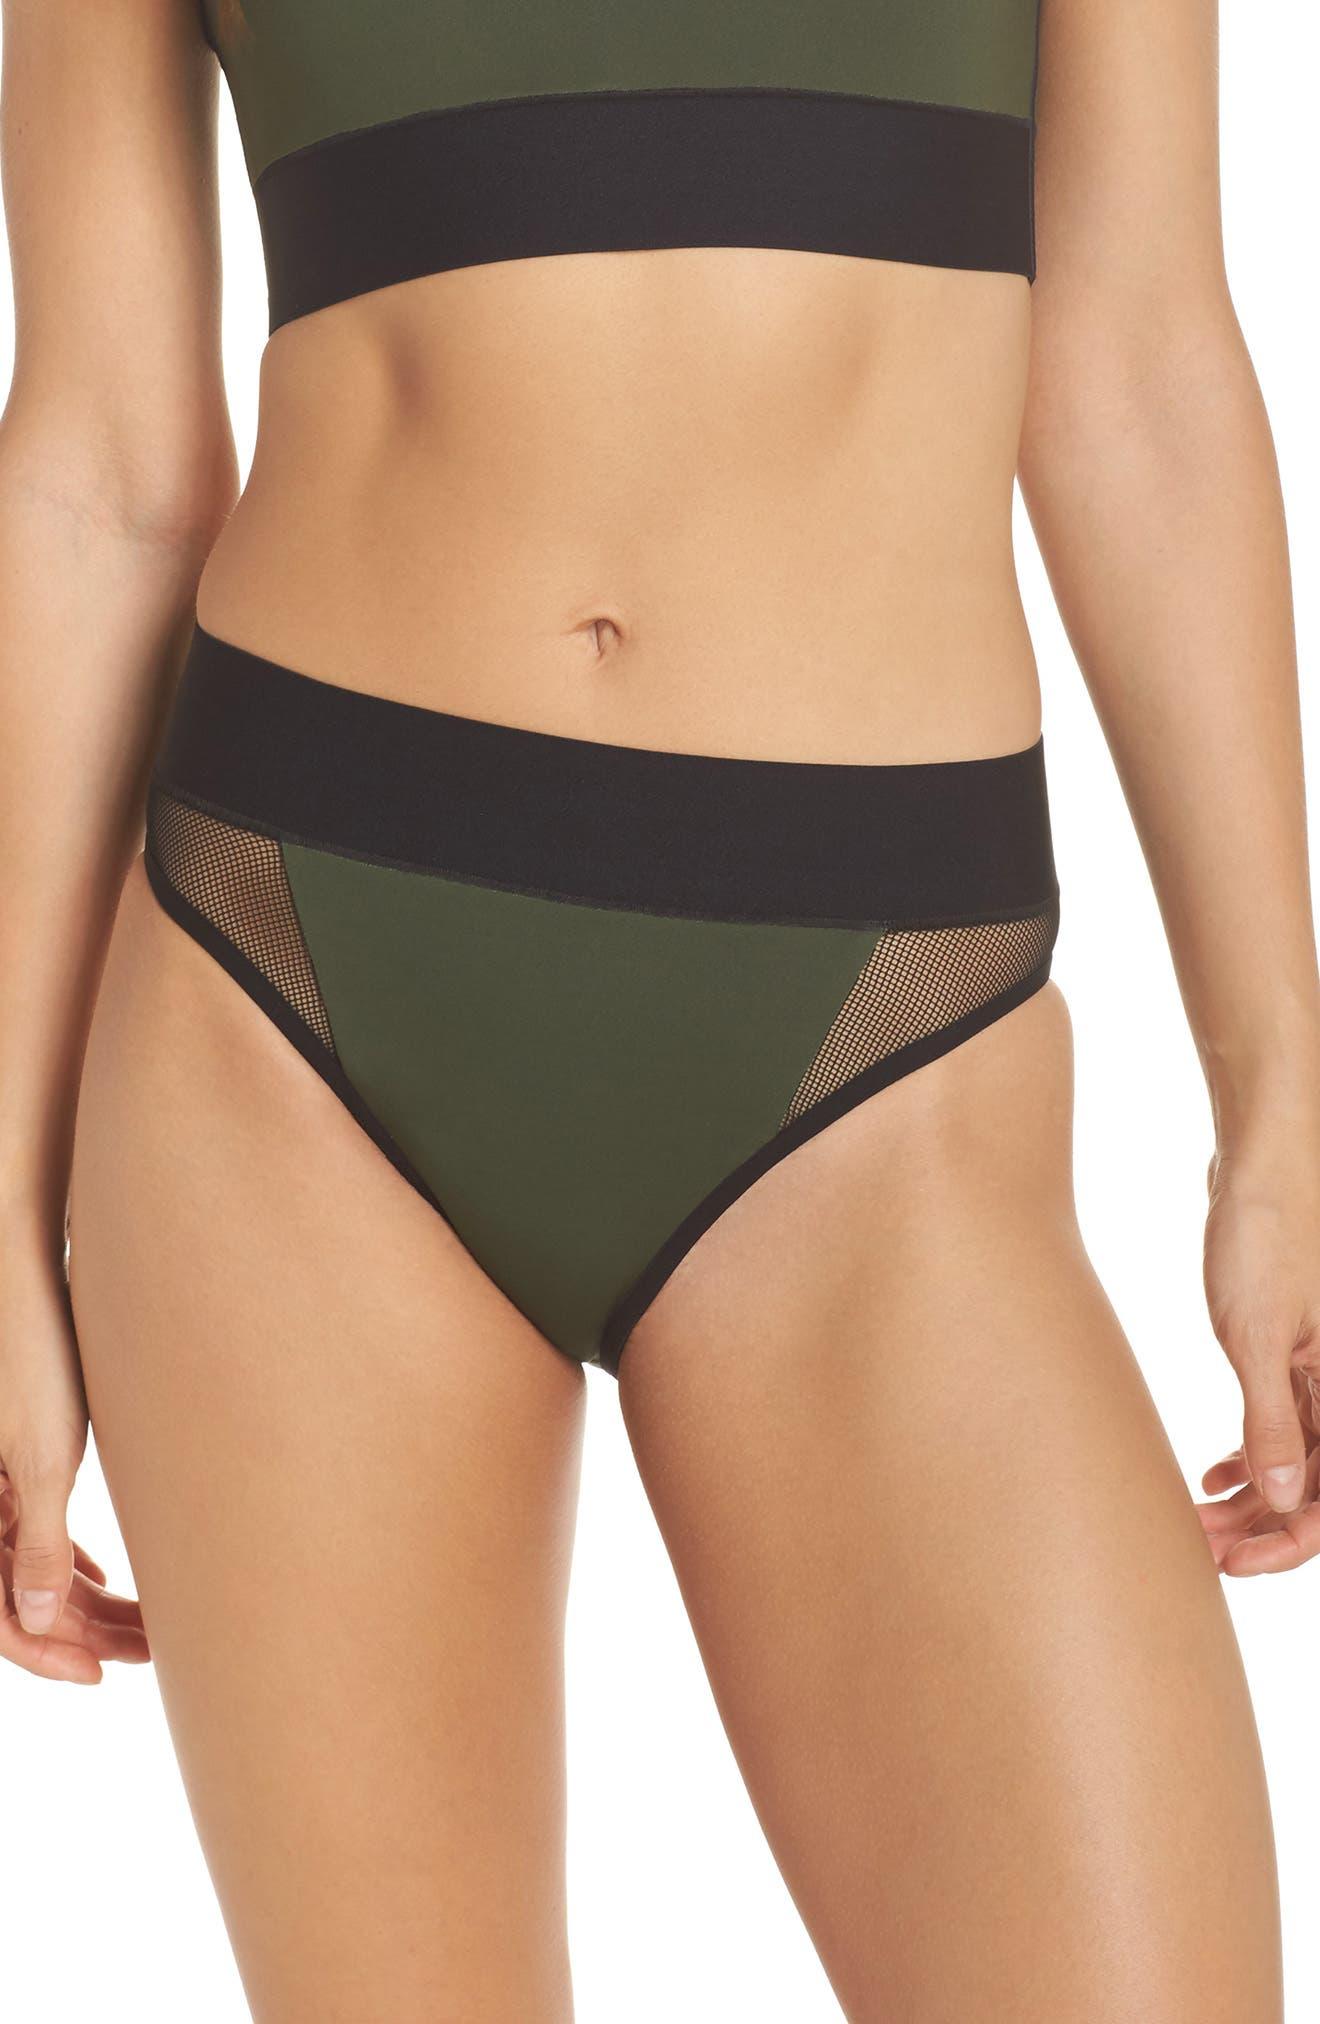 Reef Sport Mesh High-Waist Bikini Bottoms,                             Main thumbnail 1, color,                             302